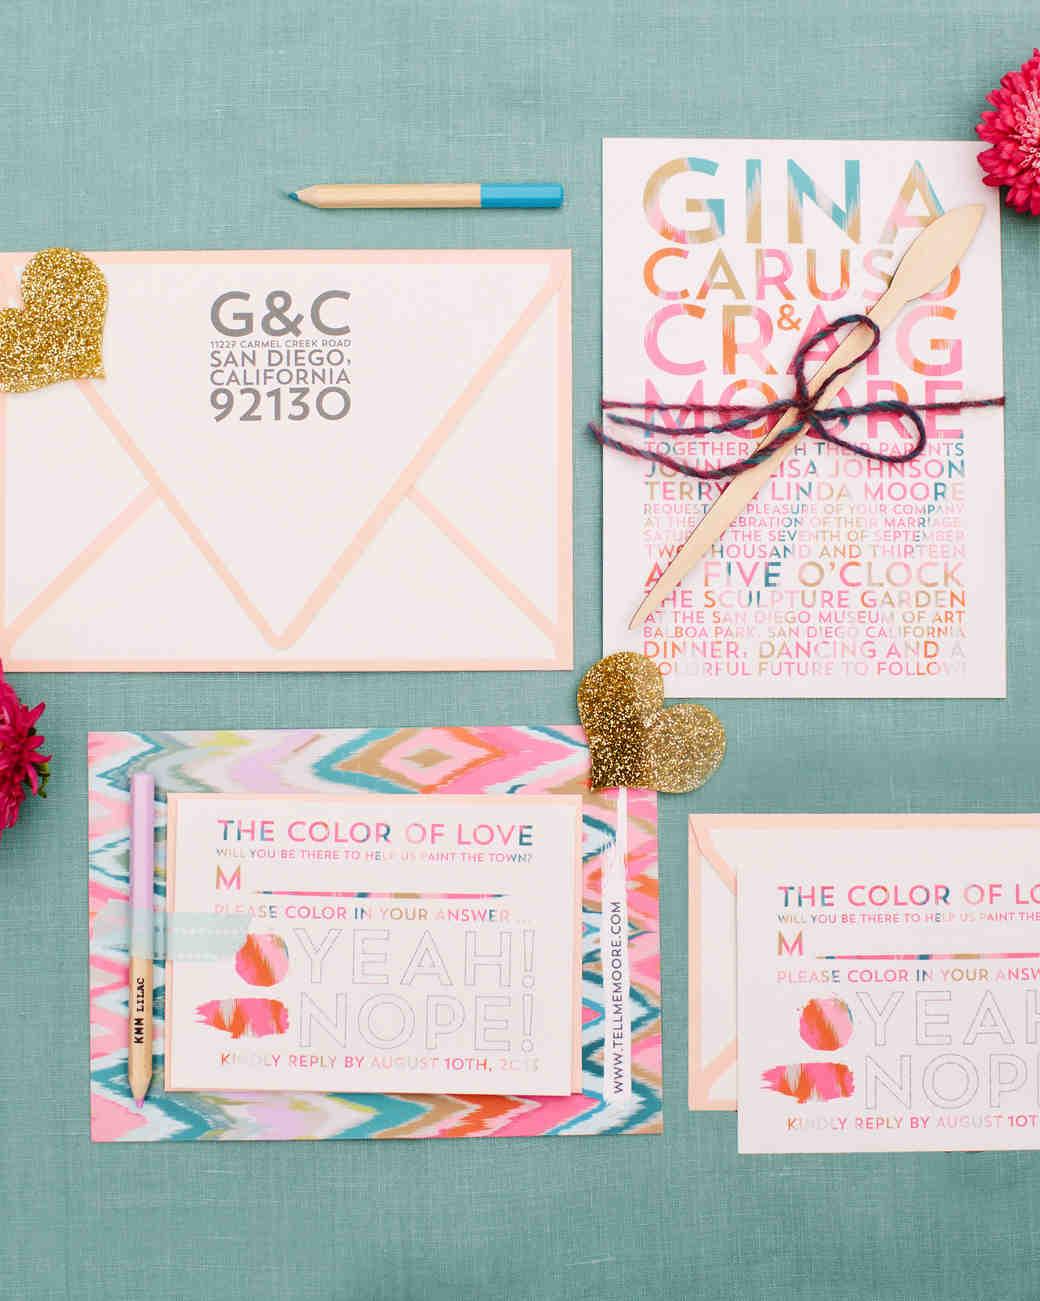 gina-craig-wedding-invite-0514.jpg